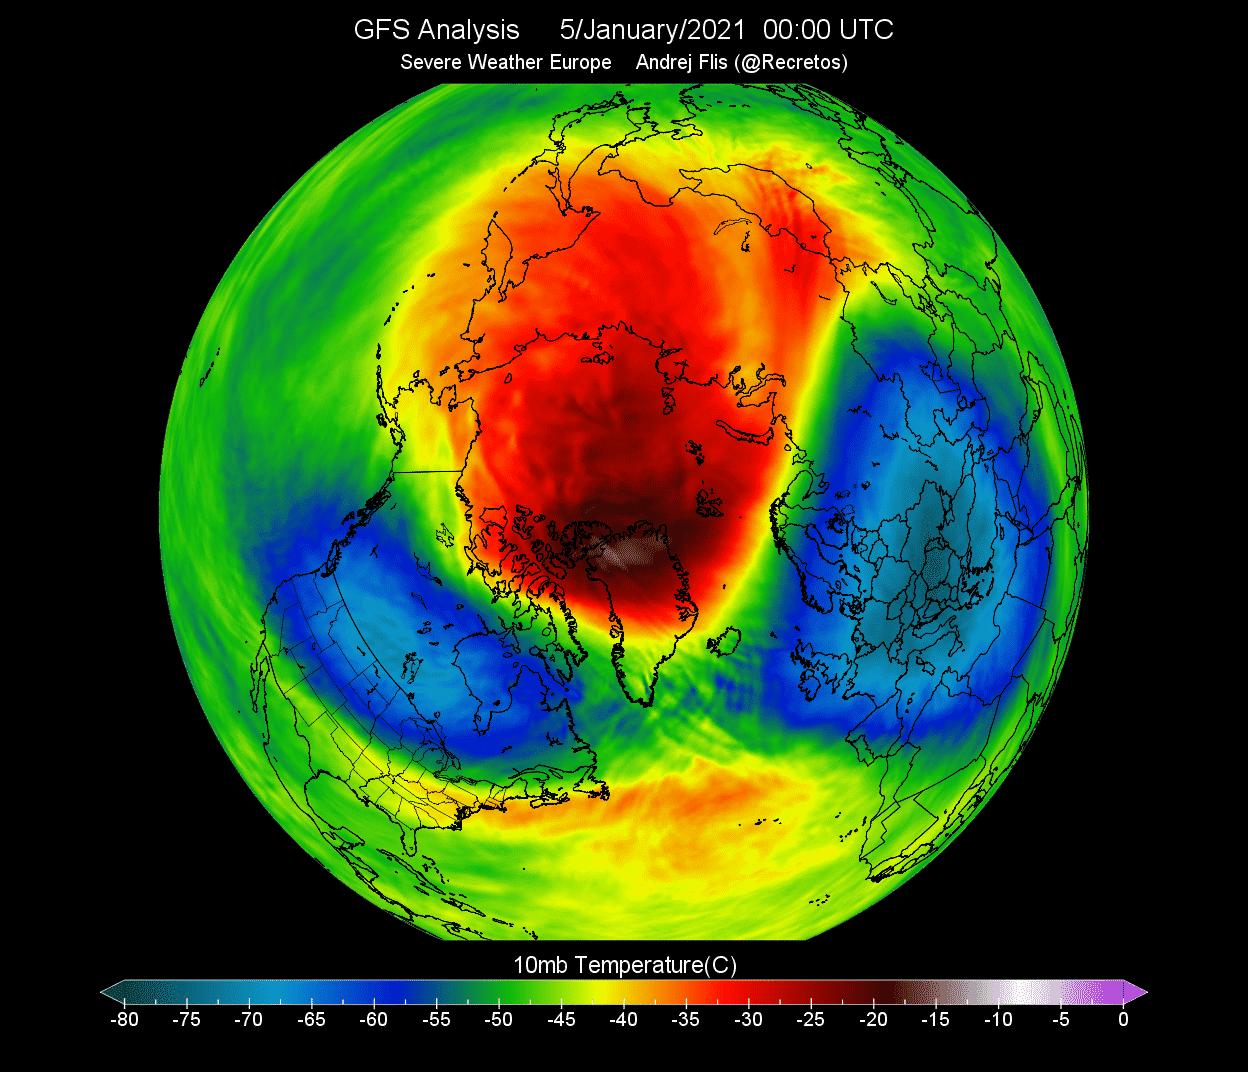 polar-vortex-splitting-weather-winter-united-states-europe-major-warming-temperature-event